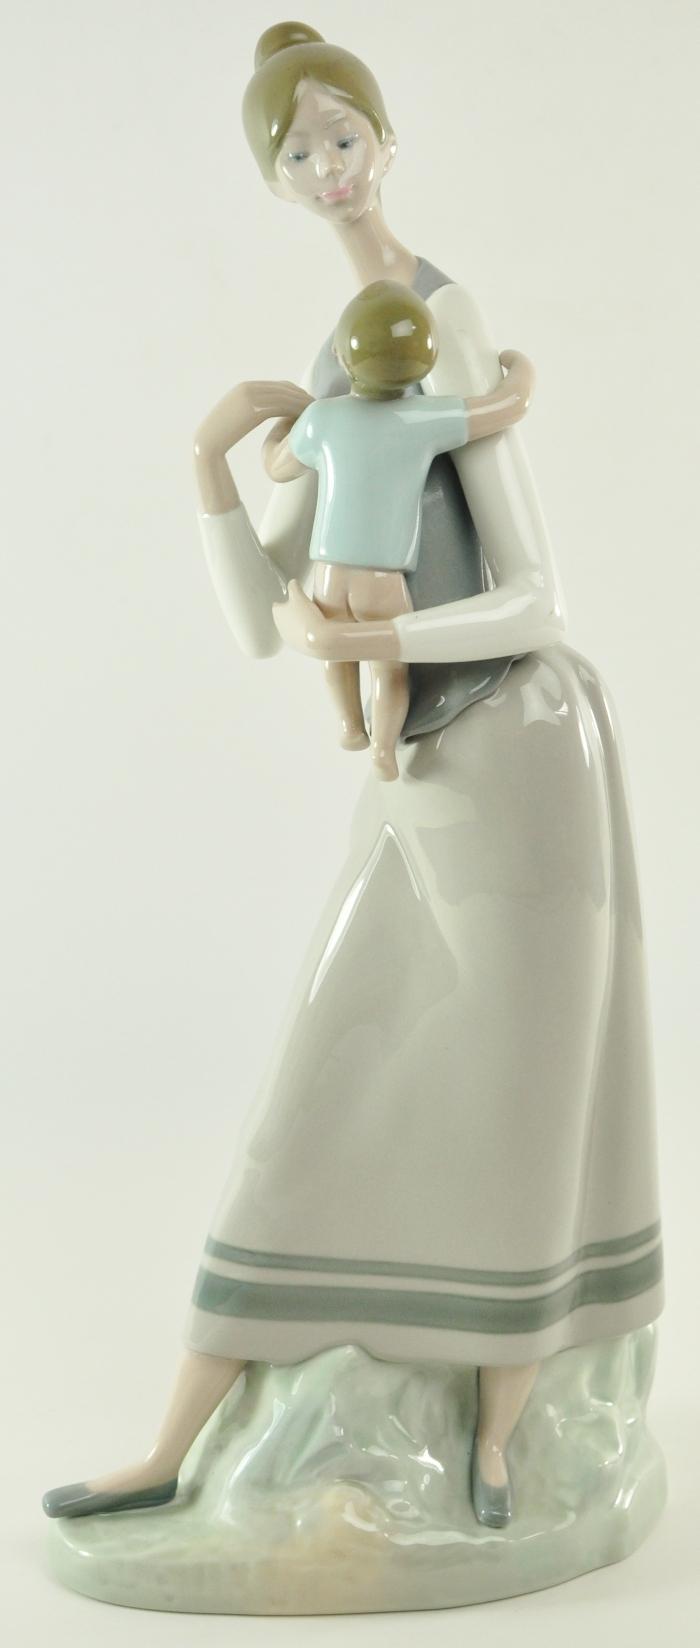 Lladro Motherhood Mother and Child Figurine Group #4701 Baby Retired Vintage  eBay